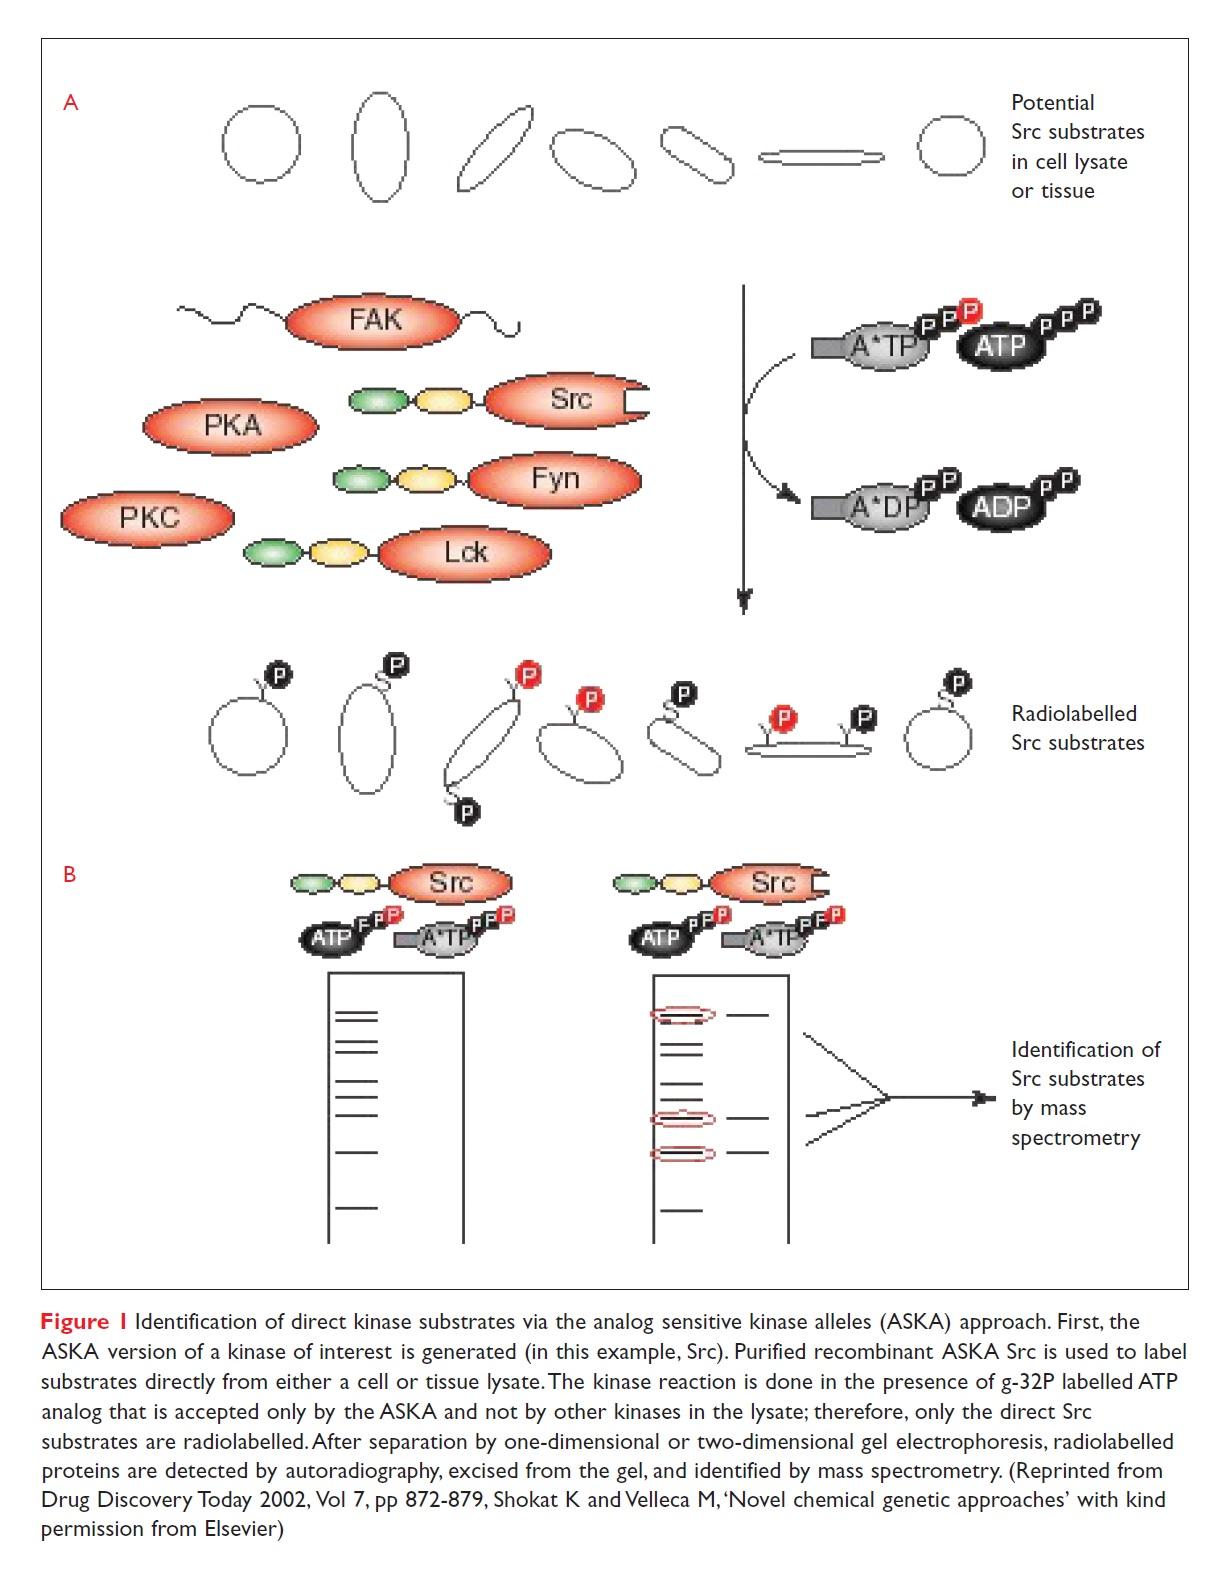 Figure 1 Identification of direct kinase substrates via the analog sensitive kinase alleles (ASKA) approach